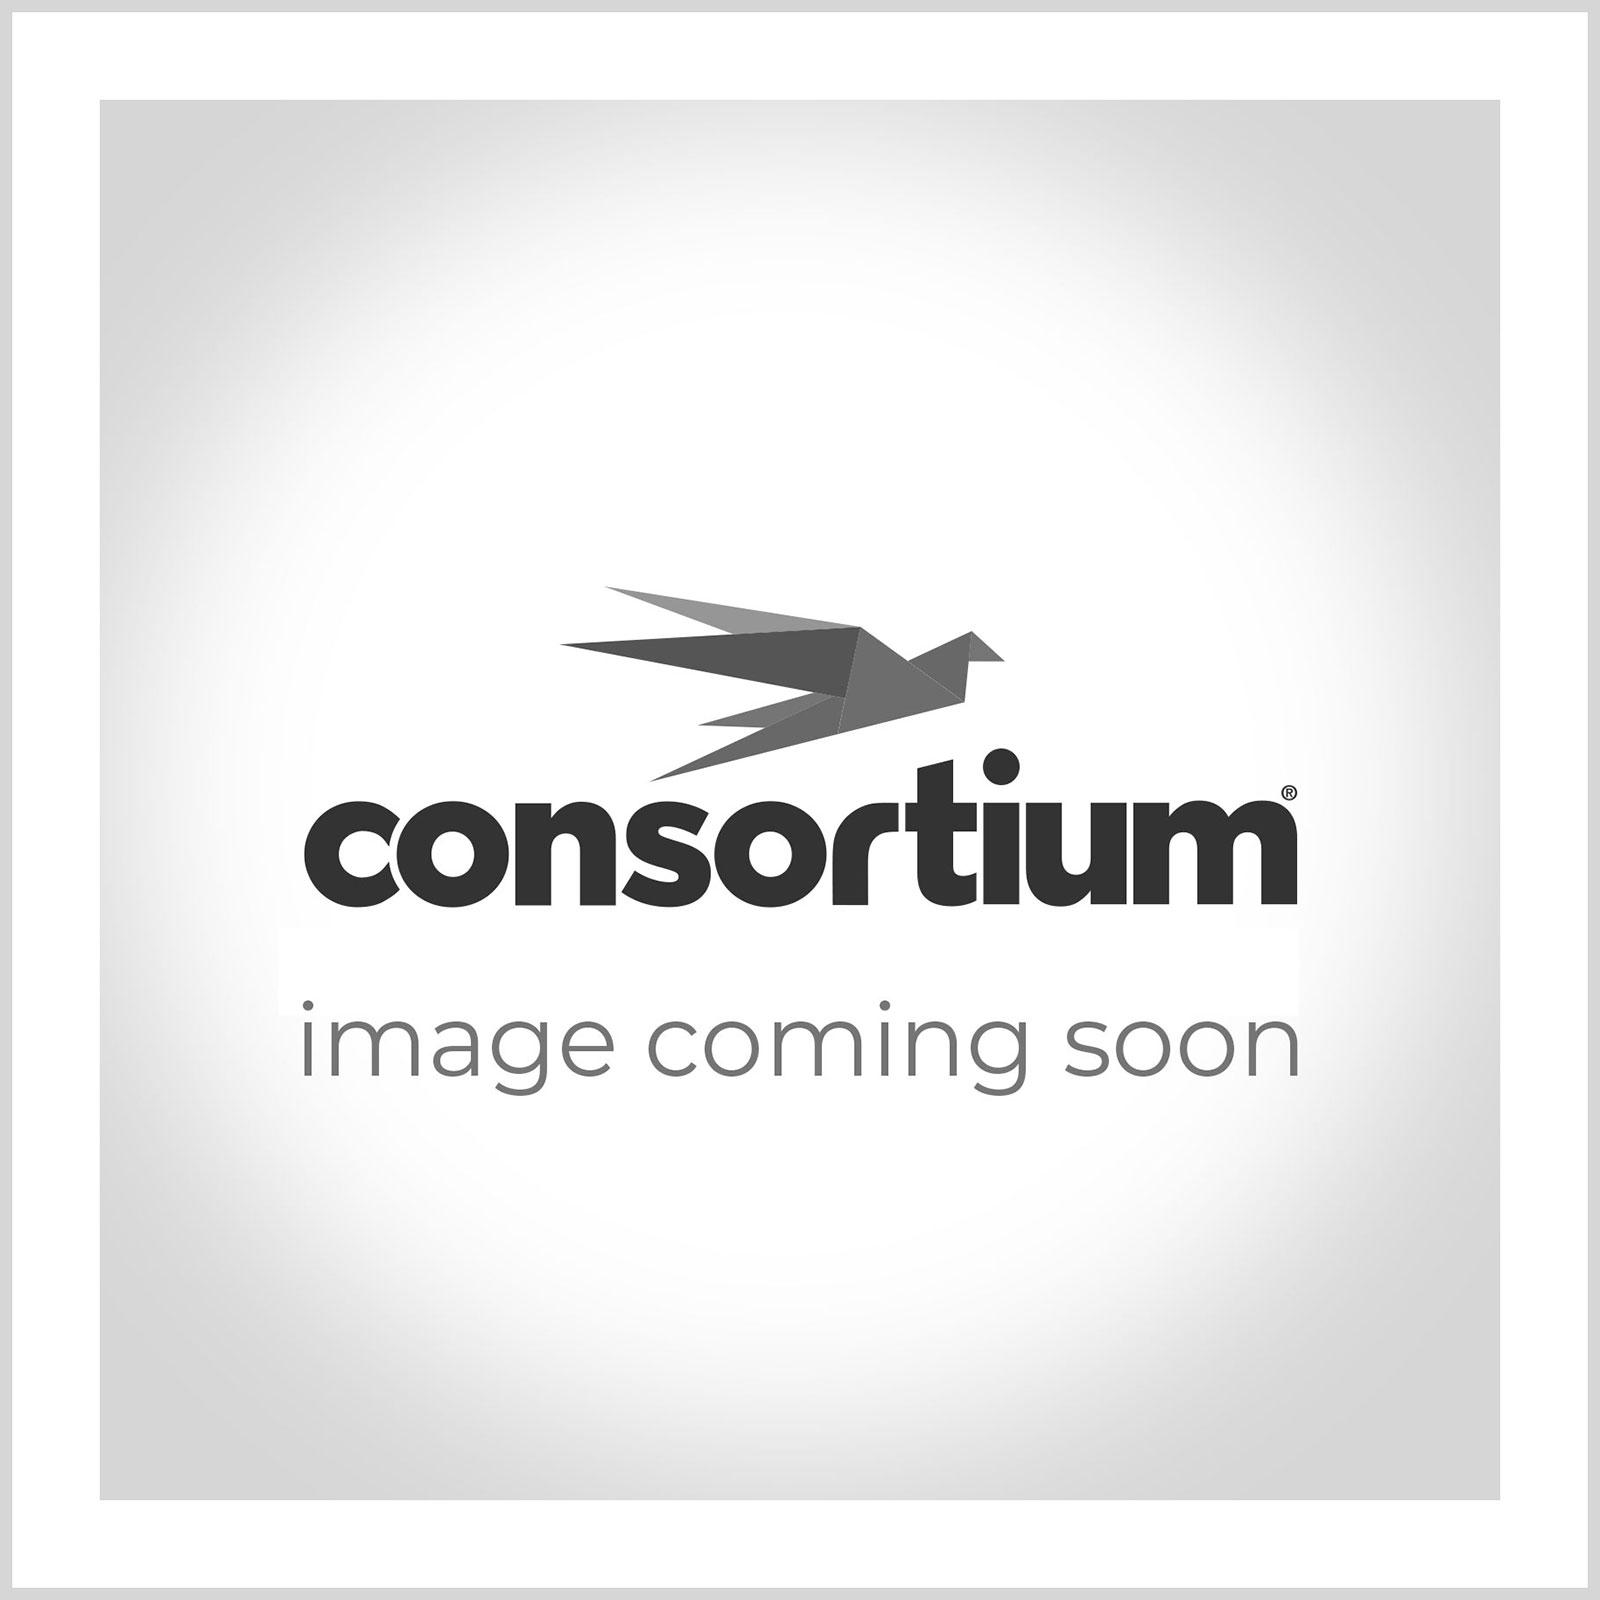 Consortium Drywipe Markers